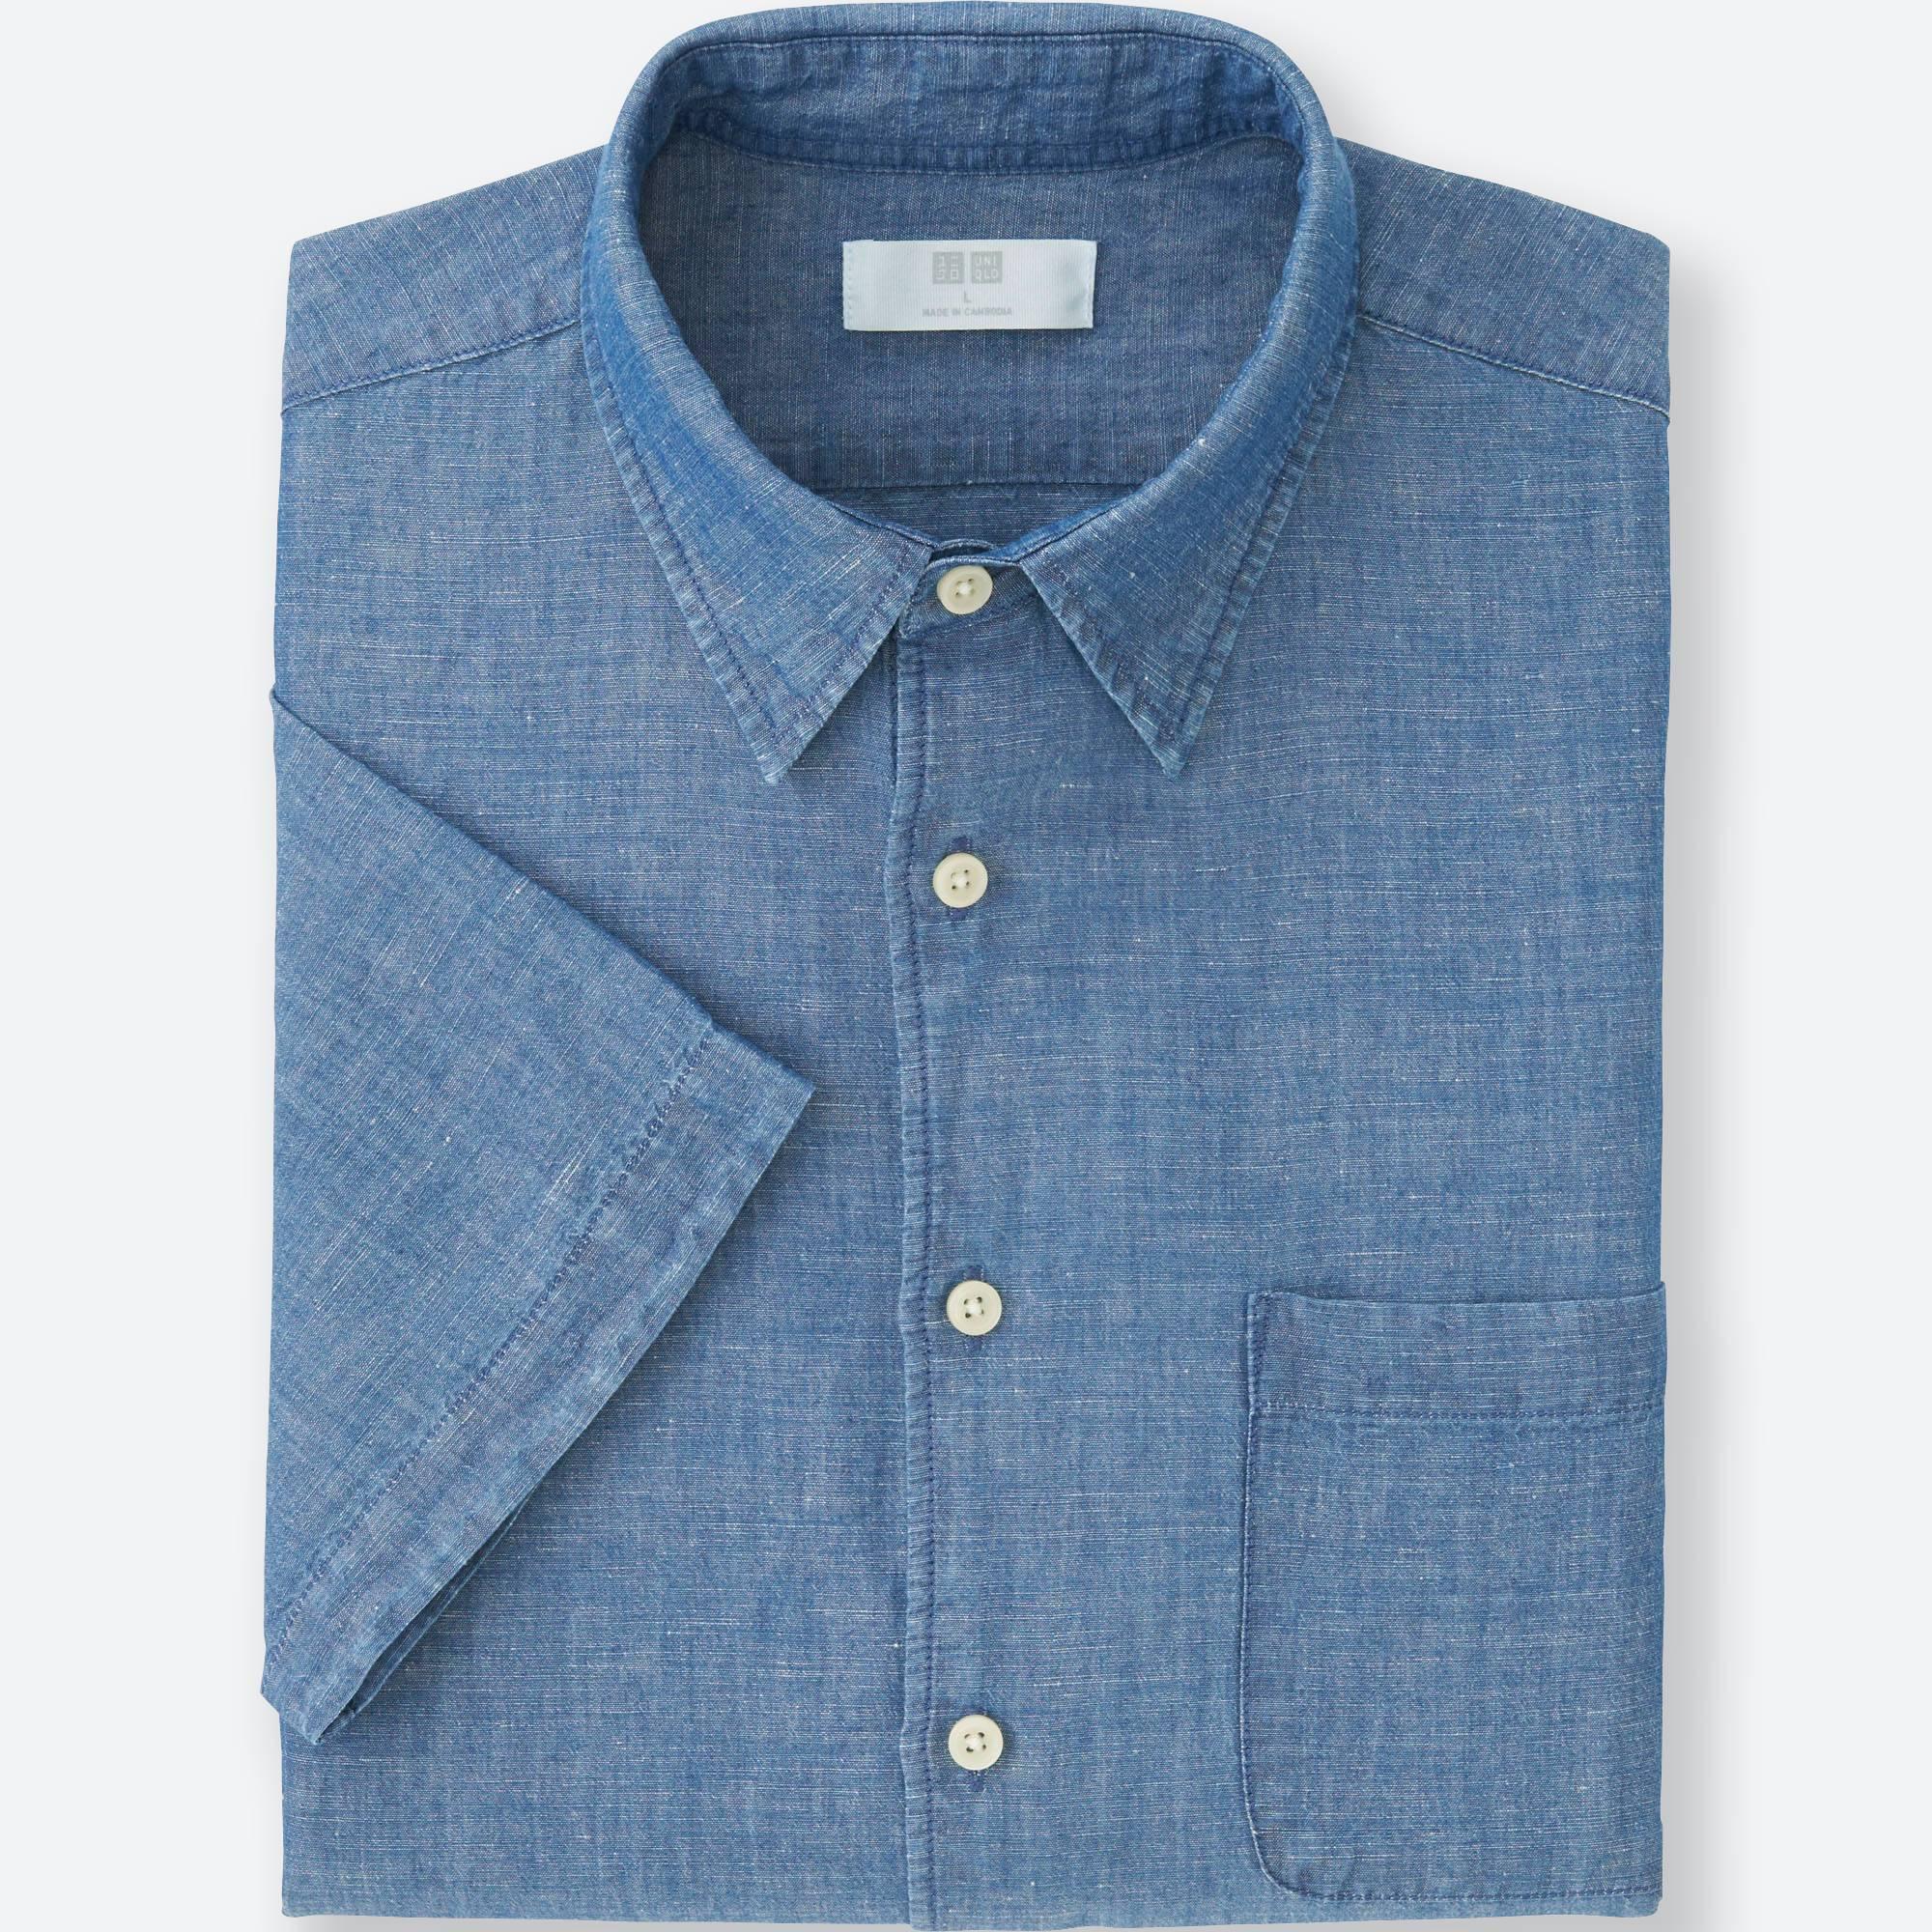 Men Linen Cotton Short Sleeve Shirt Uniqlo Us Hoc Premium Bluedark Full Set Suit Images